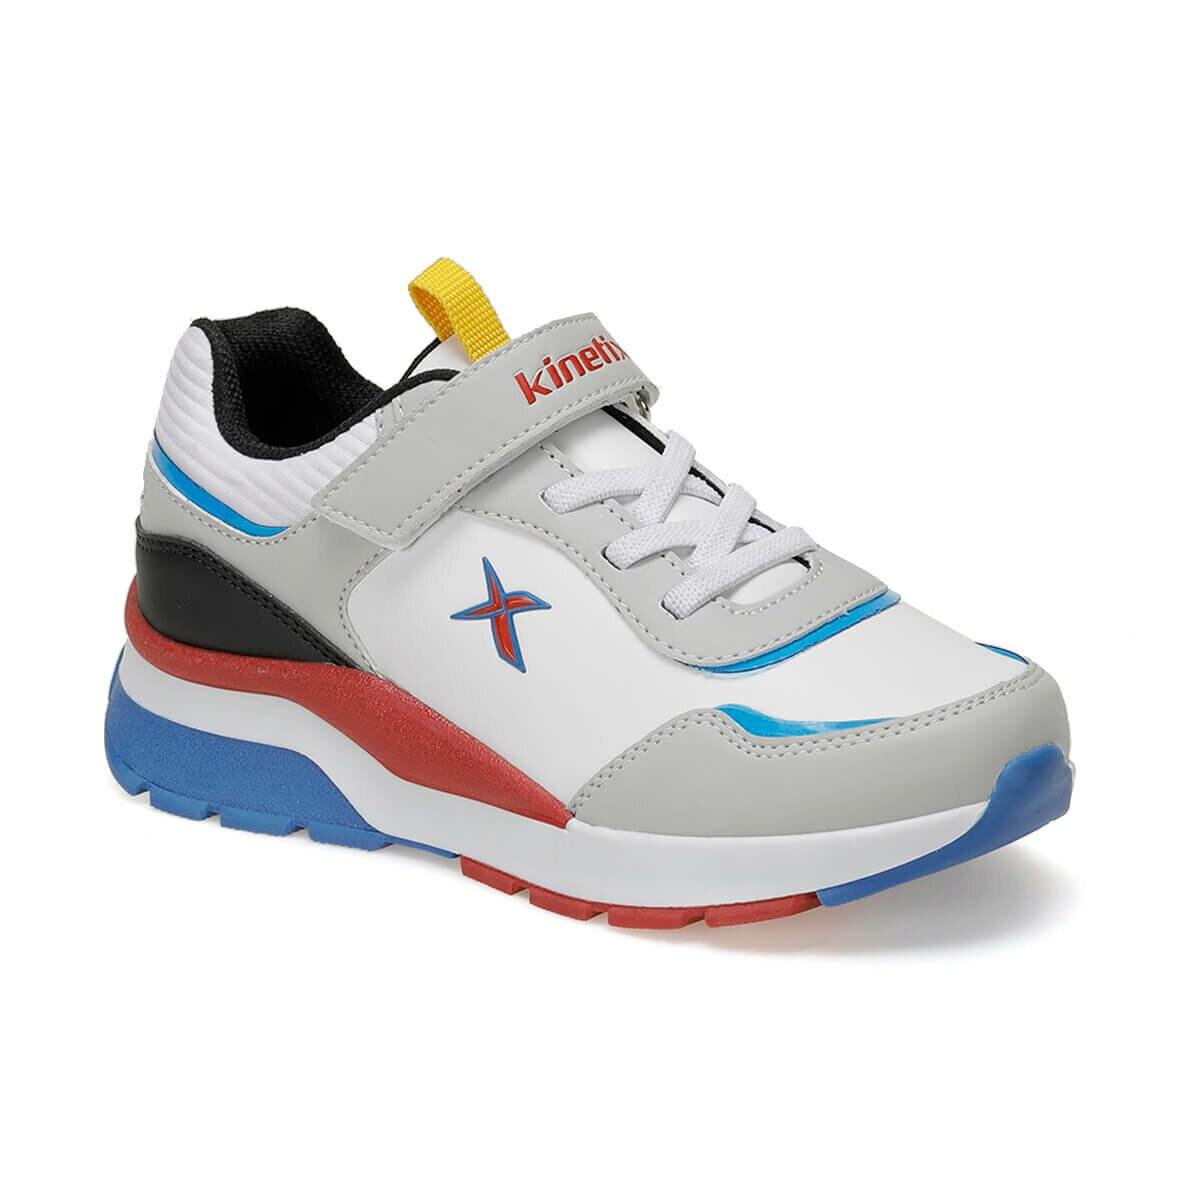 FLO BRIGHT 9PR White Male Child Sneaker Shoes KINETIX